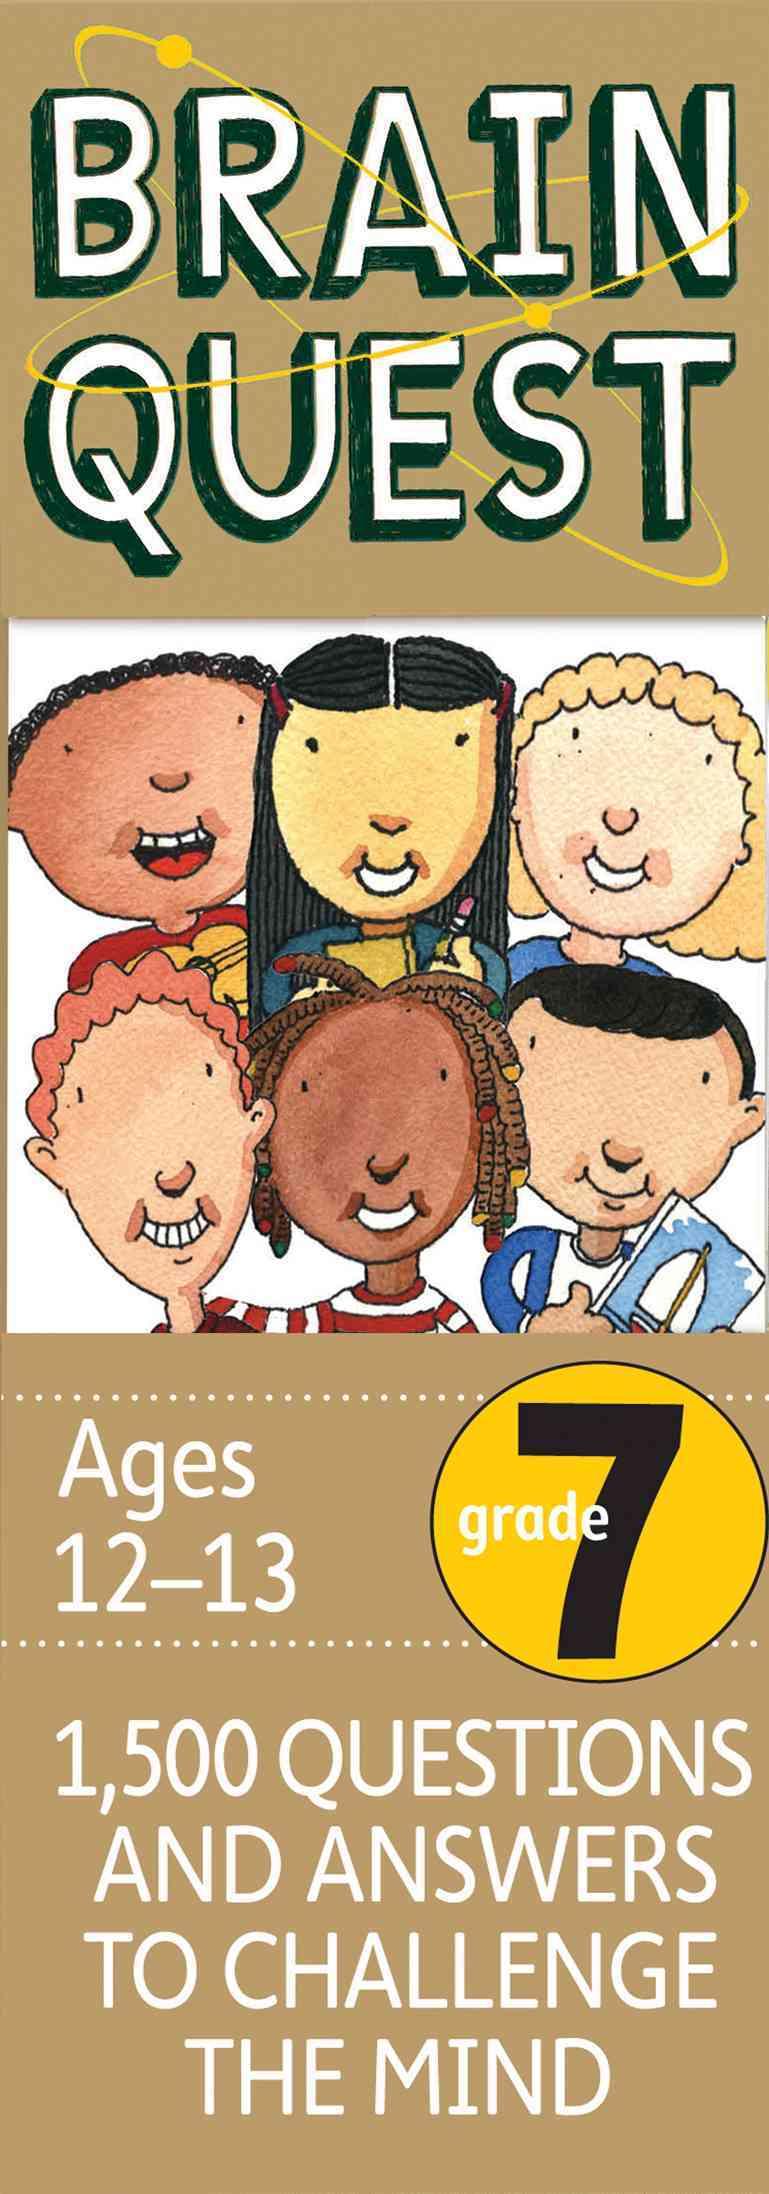 Brain Quest Grade 7 By Feder, Chris Welles/ Bishay, Susan